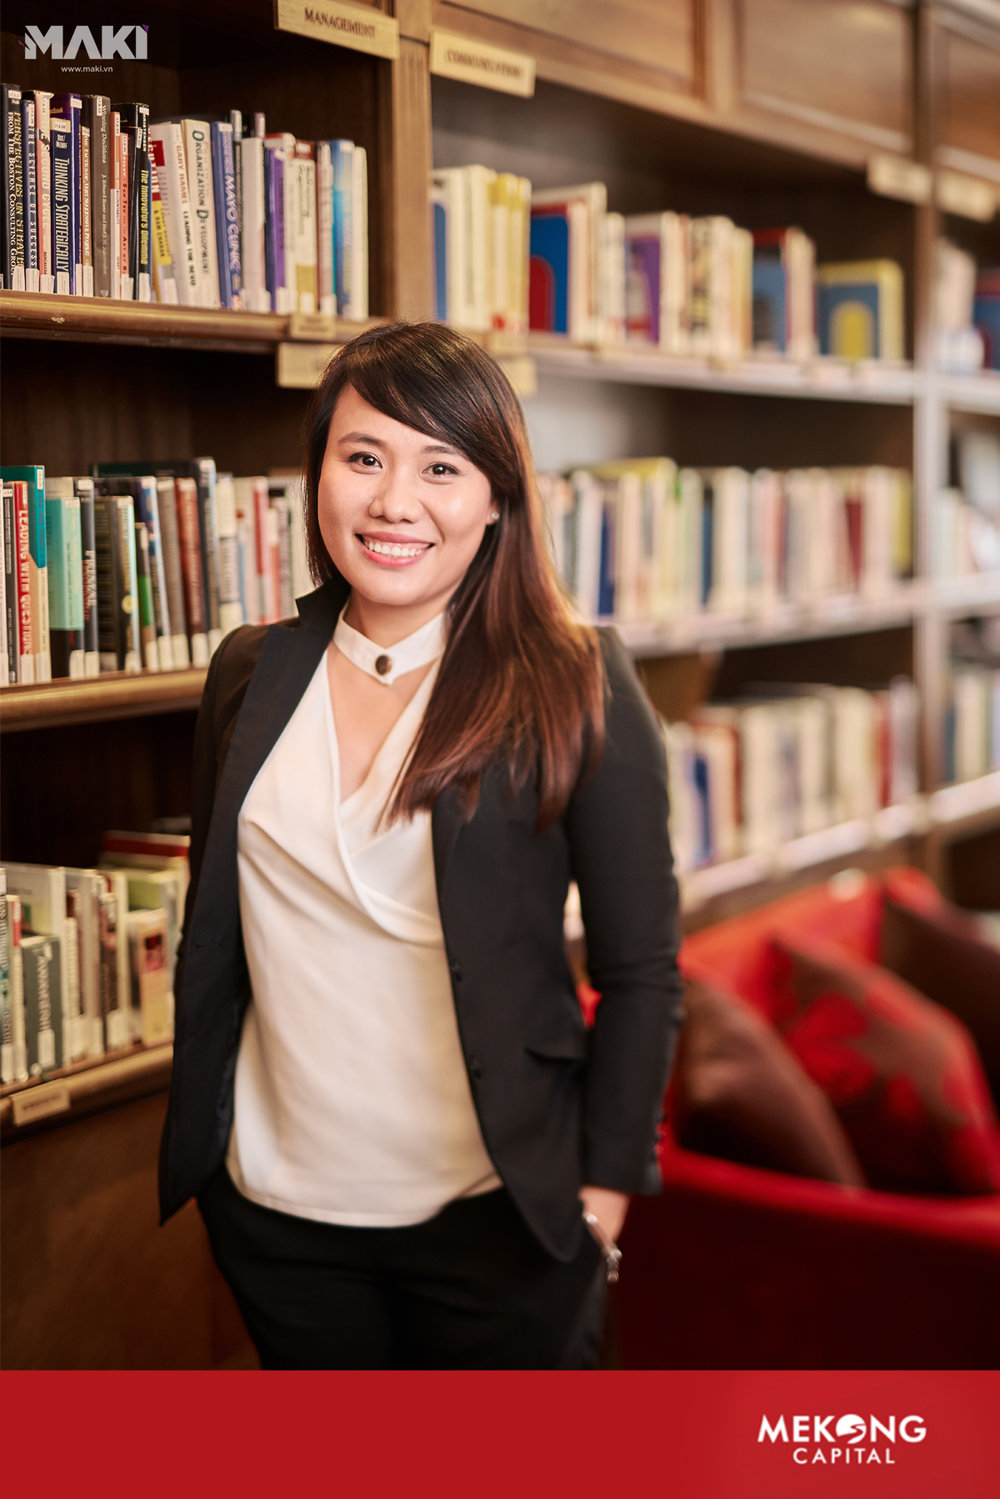 chup-anh-profile-cong-ty-mekong-capital-5.jpg